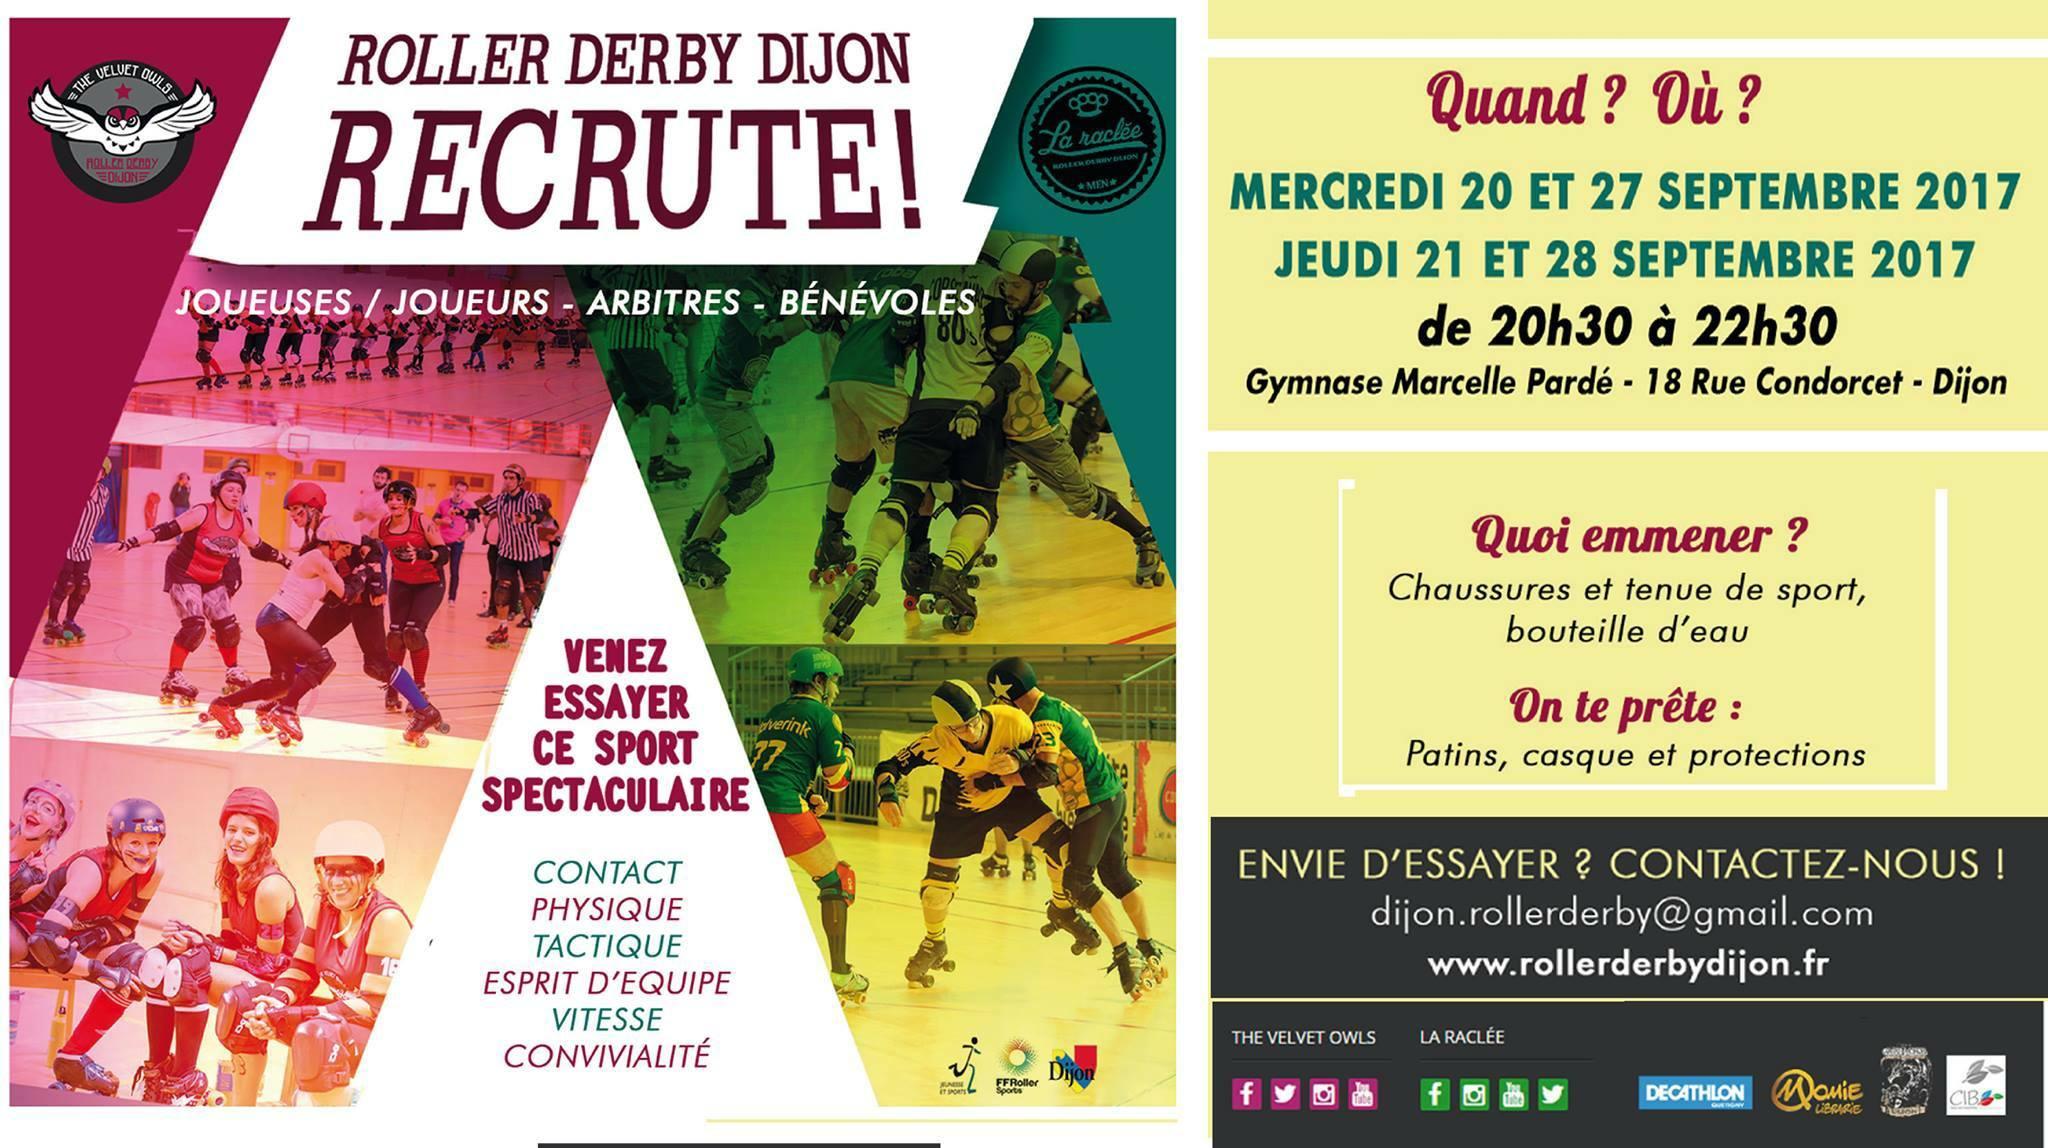 Derby Dijon Roller Dijon Dijon Dijon Roller Roller Derby Roller Derby Derby gtP7O